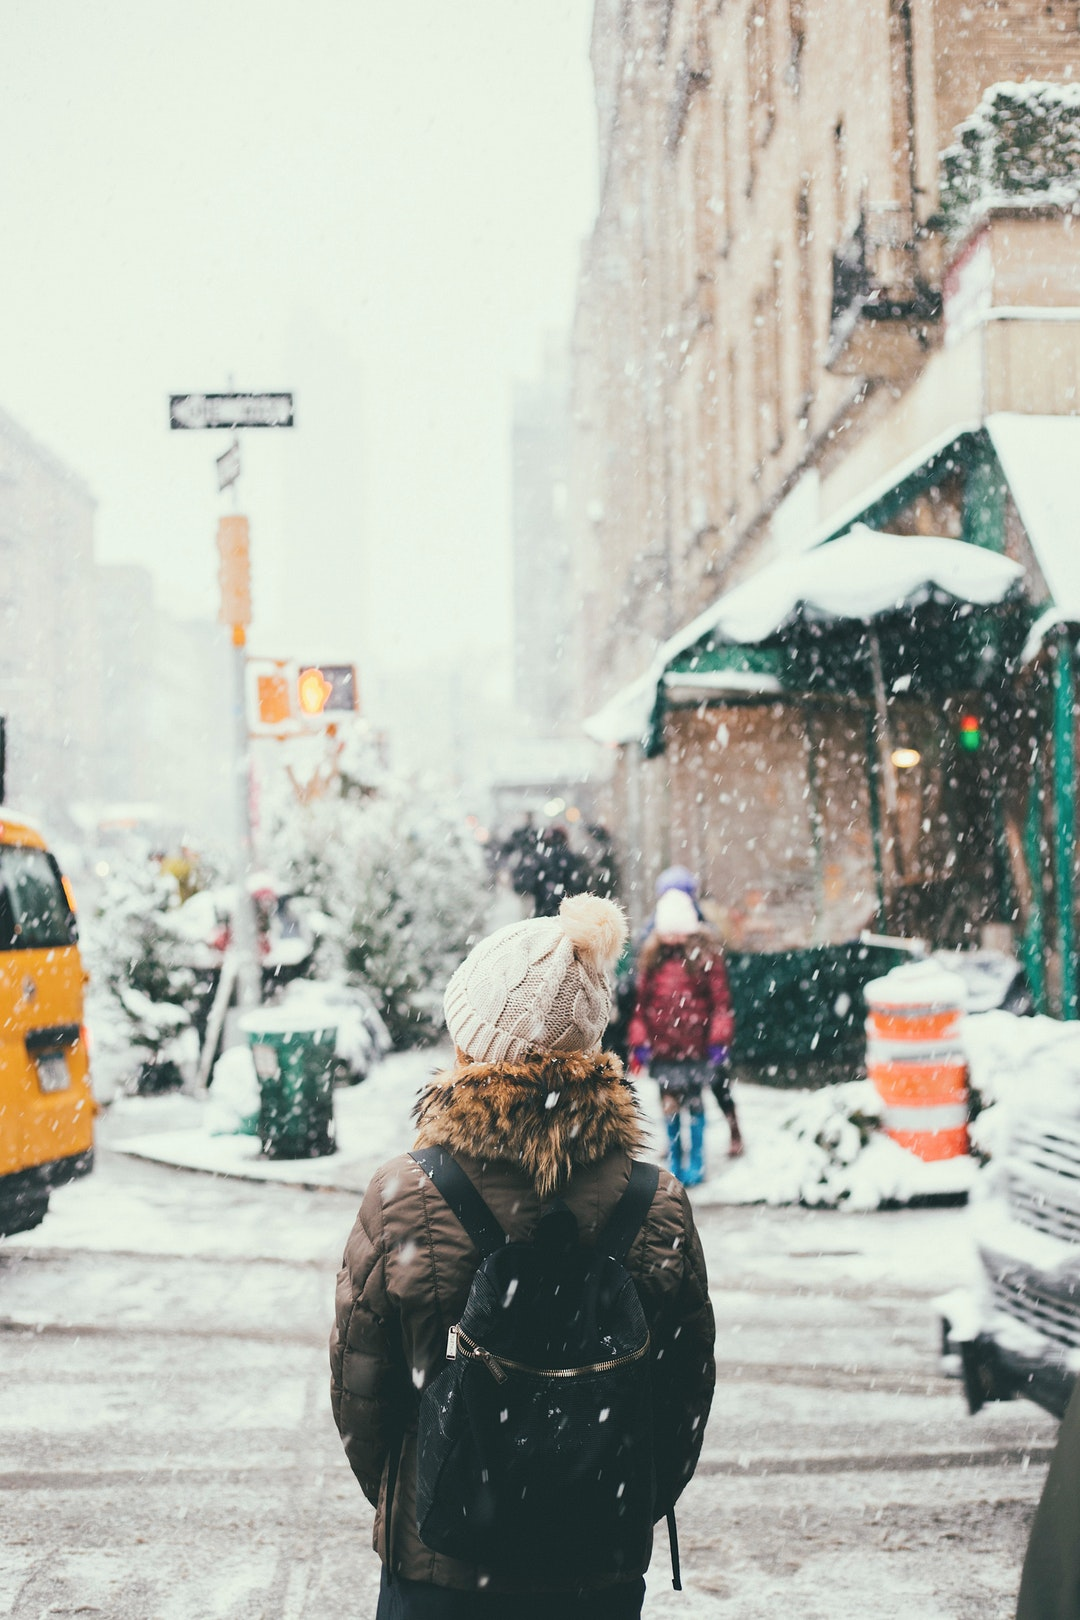 Winter Blues: How to Fight Seasonal Depression